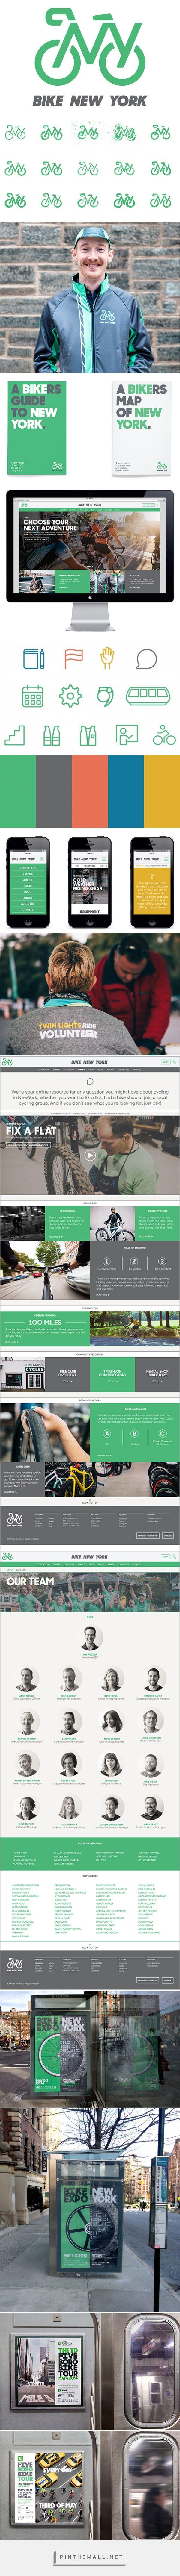 New Work: Bike New York   New at Pentagram - created via http://pinthemall.net